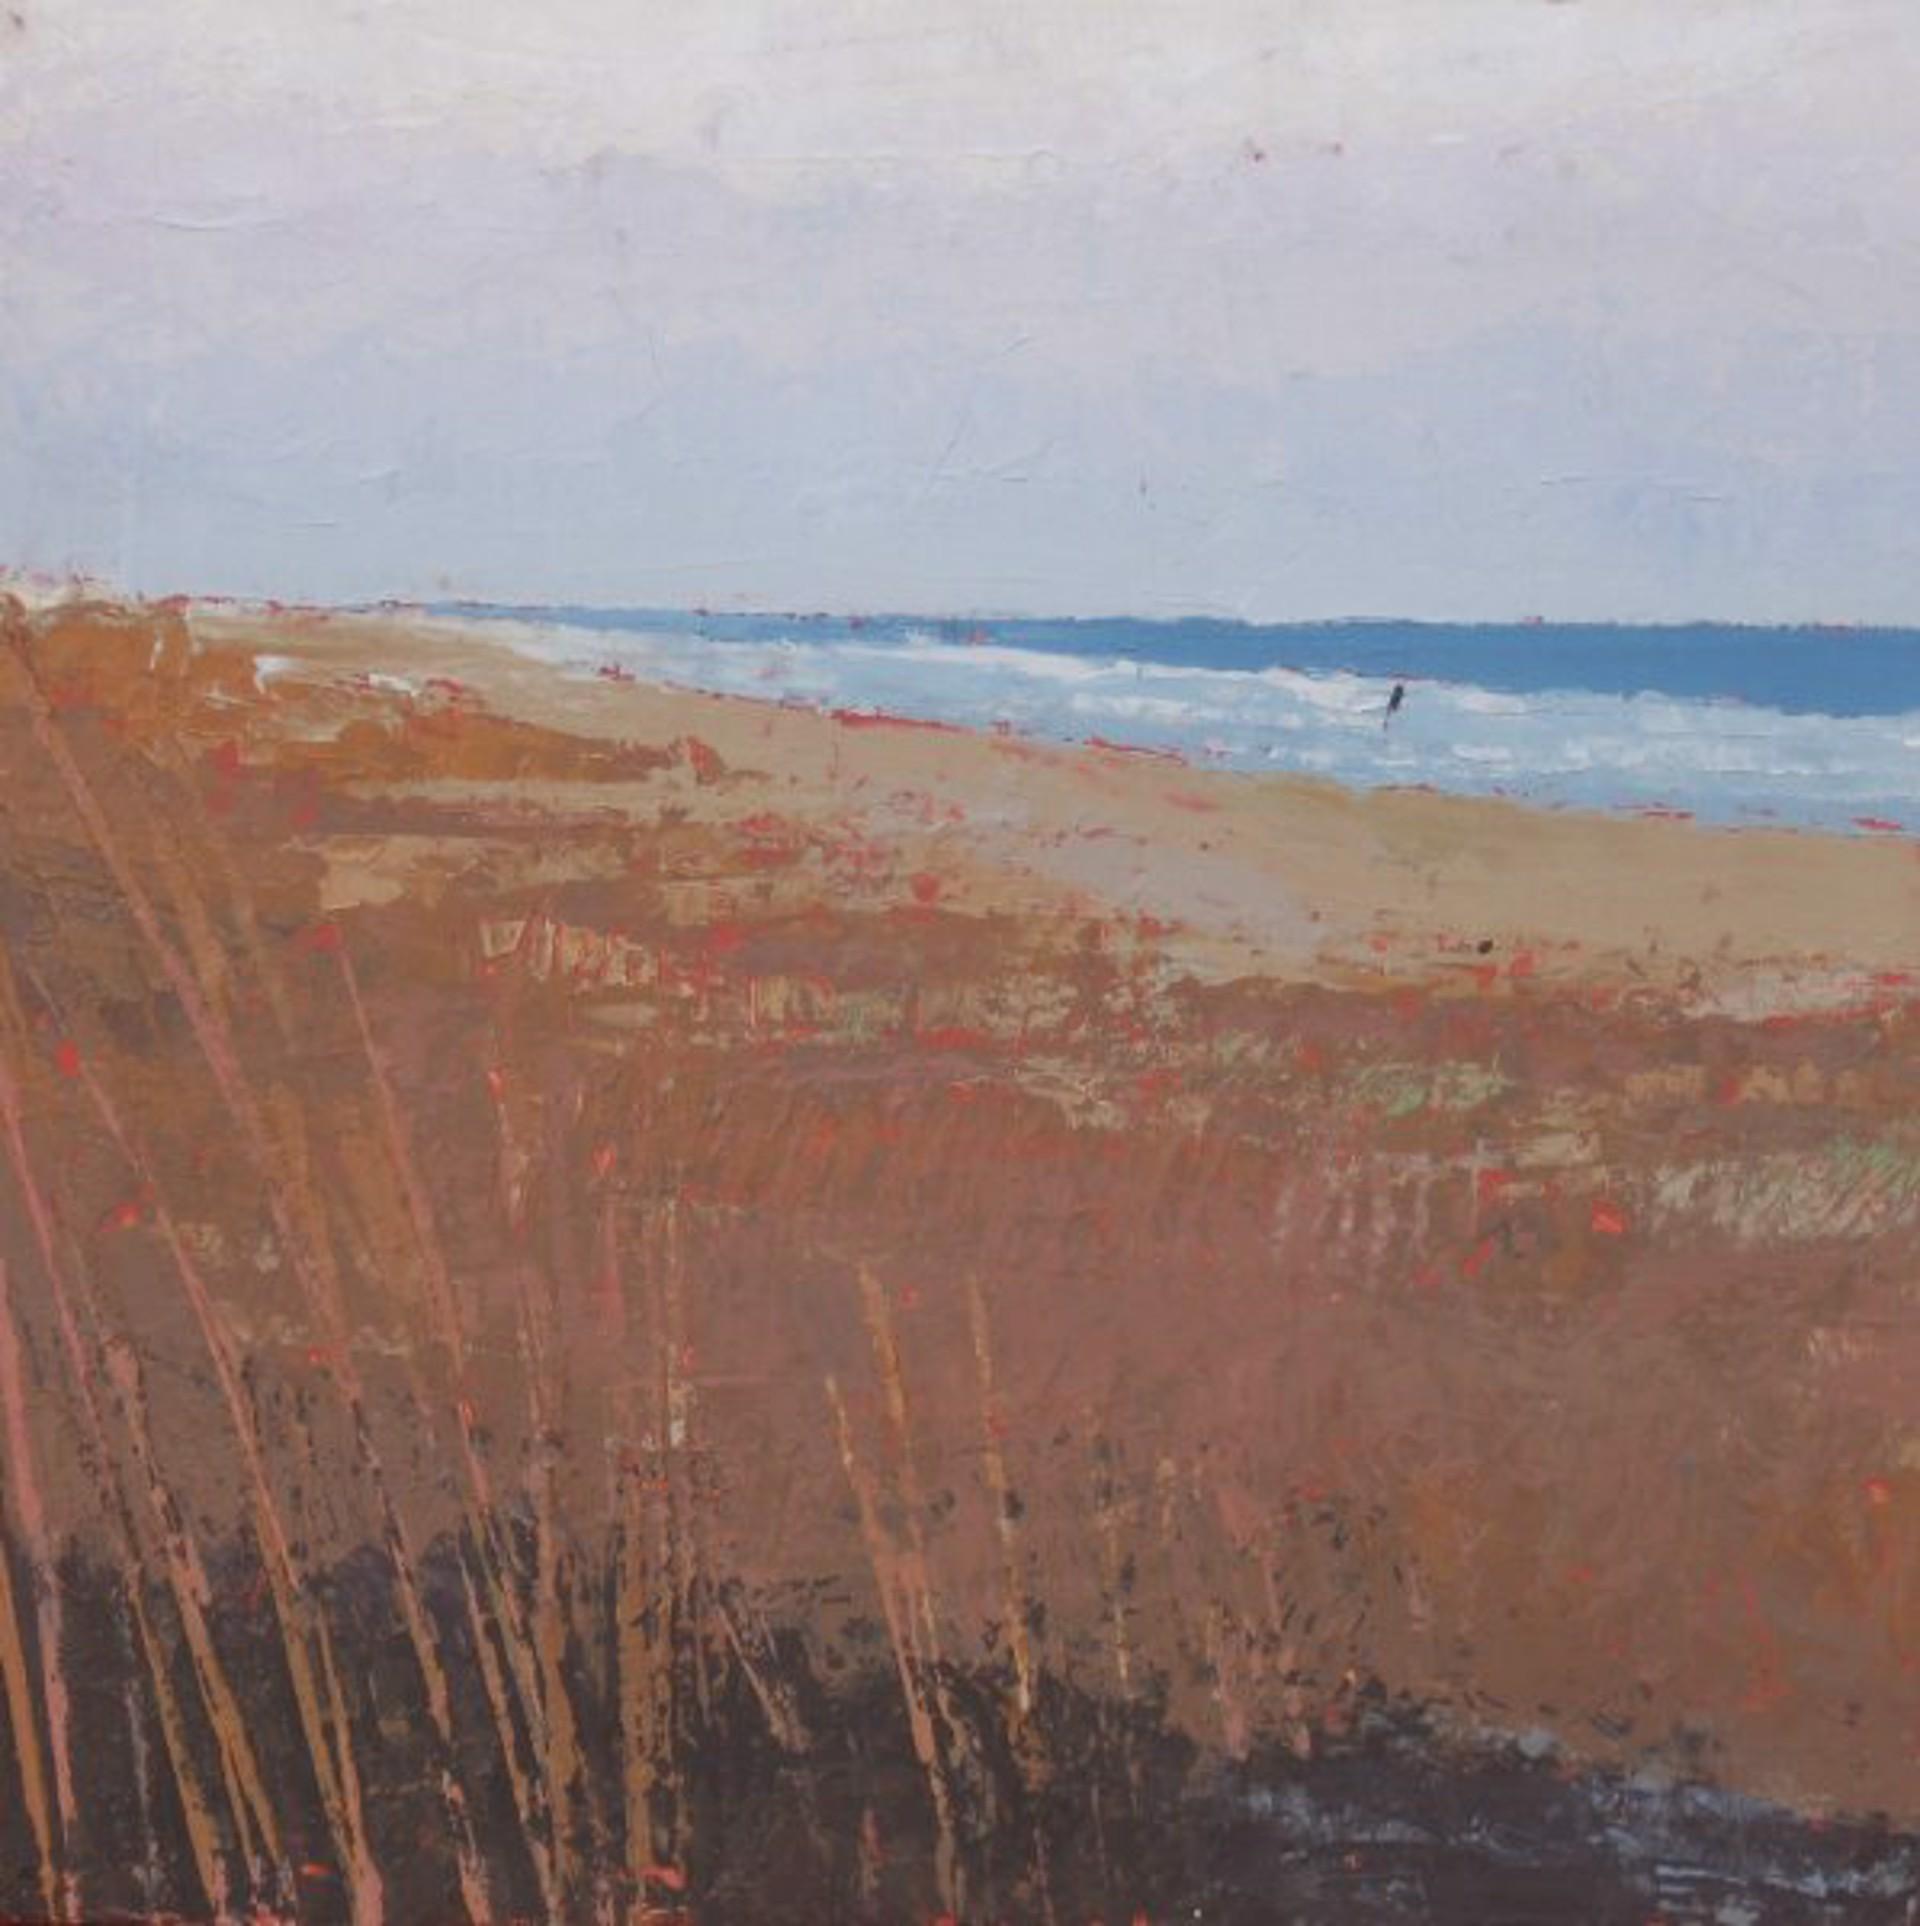 Land, Water, Sky #24 by Richard Garrison